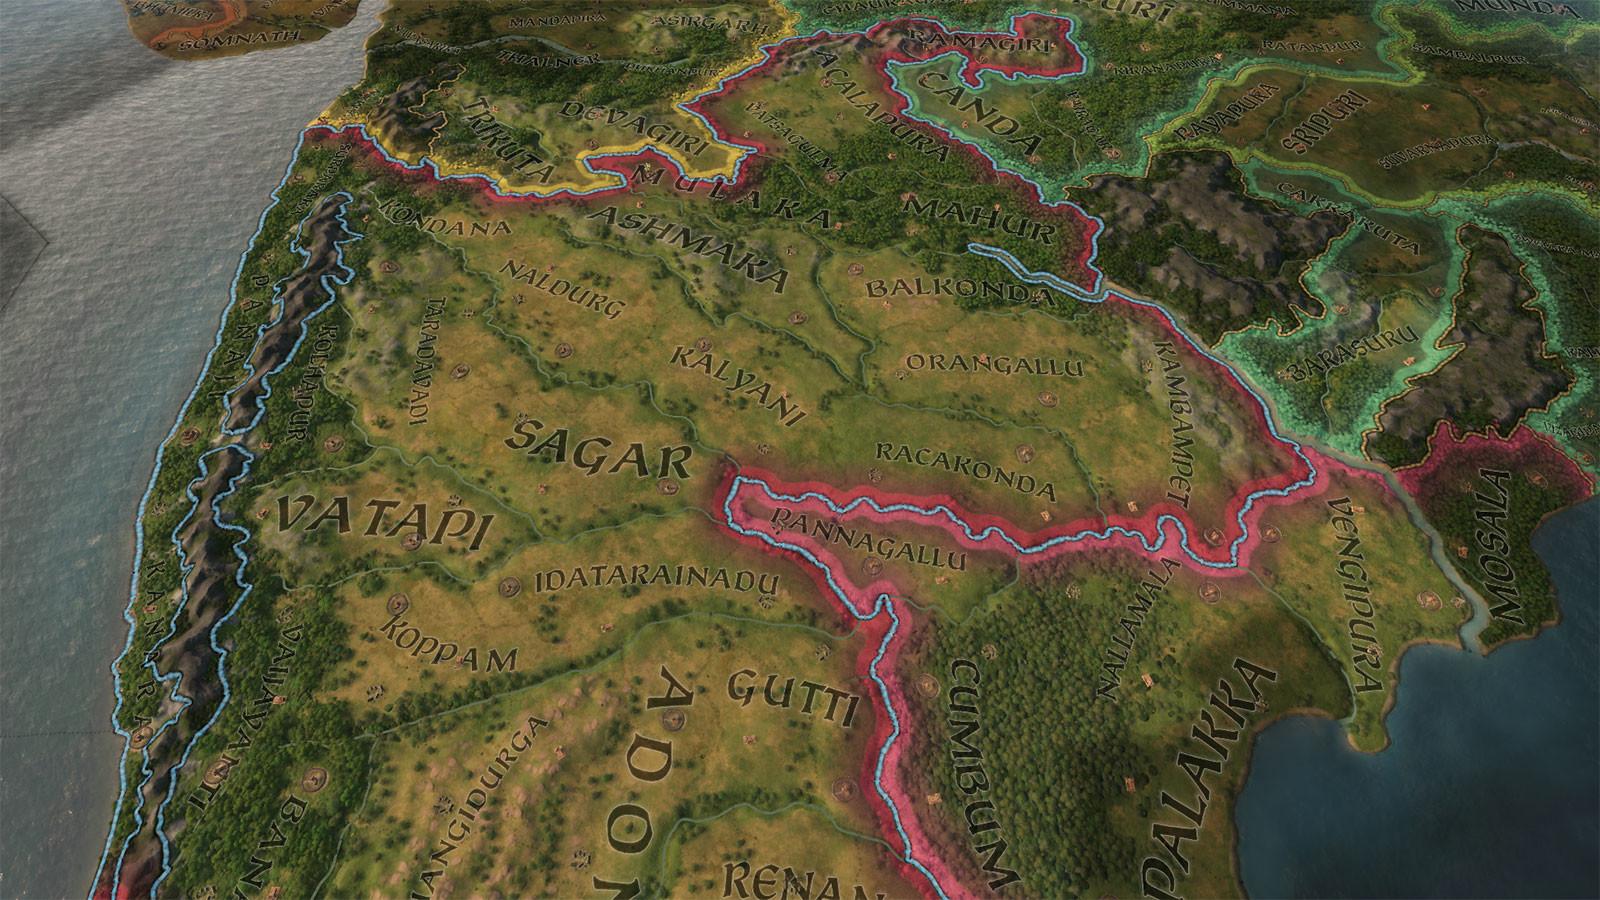 Crusader Kings III: Royal Edition | CN_KR_LATAM_TR (59c4cf21-2efb-4829-a77b-23e0ac670140)